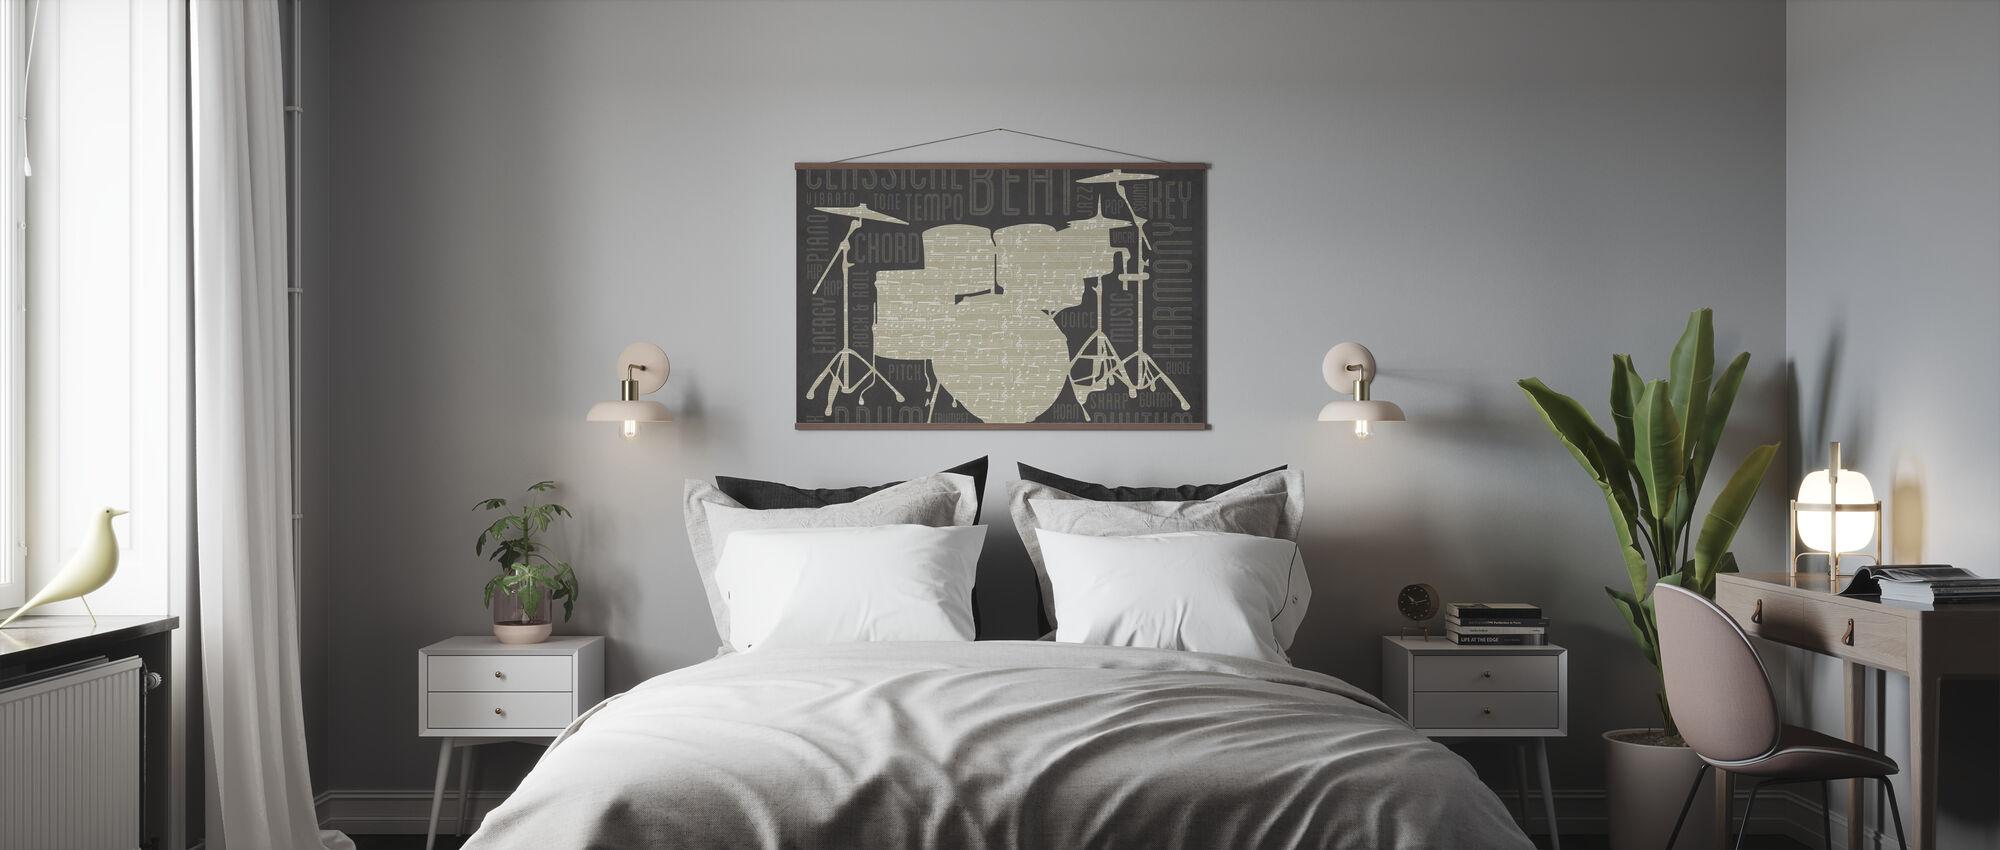 Drums - Poster - Bedroom